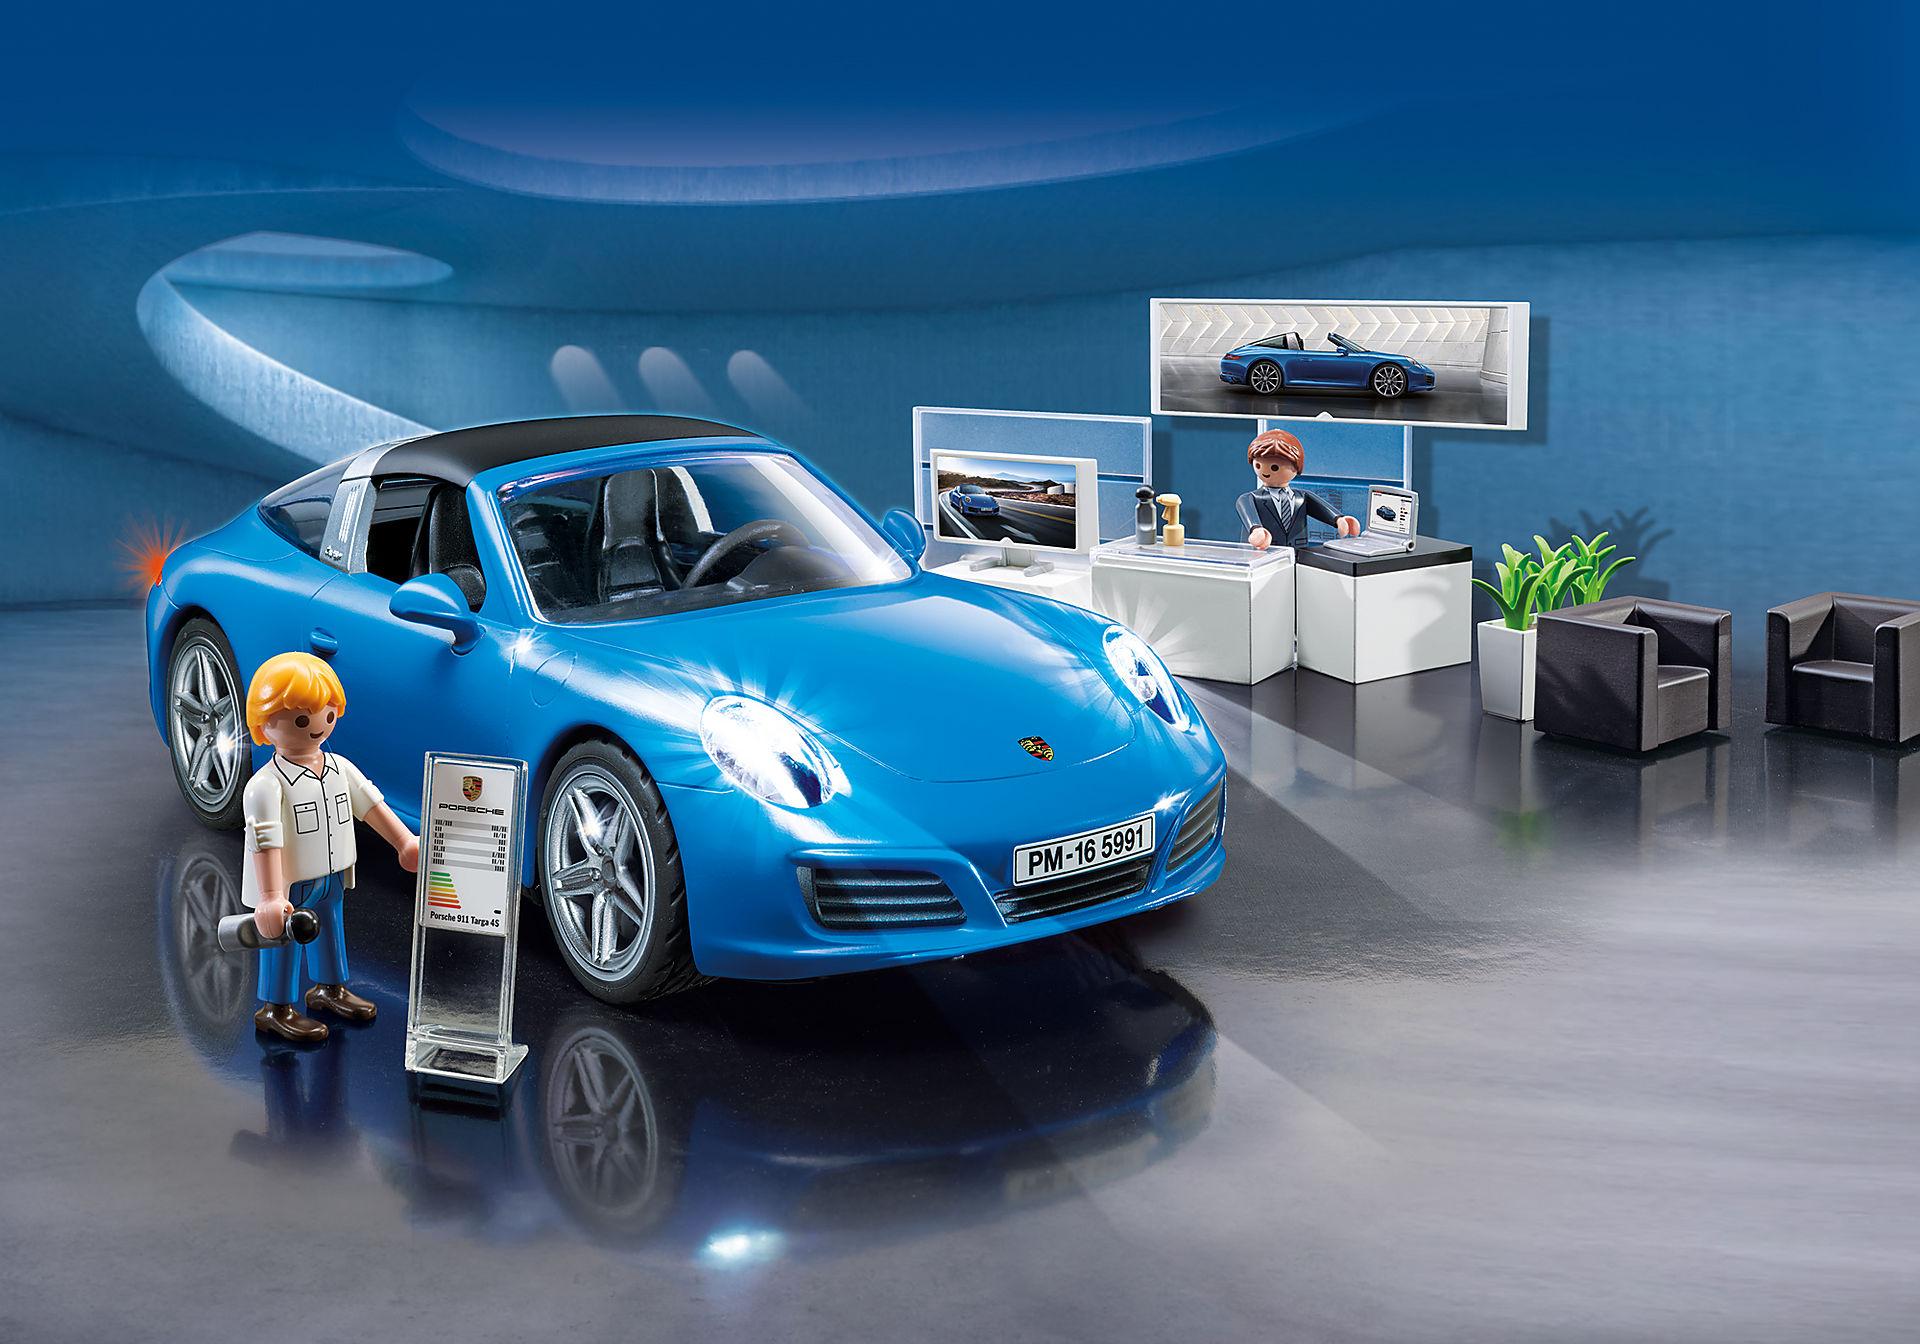 5991 Porsche 911 Targa 4S zoom image1